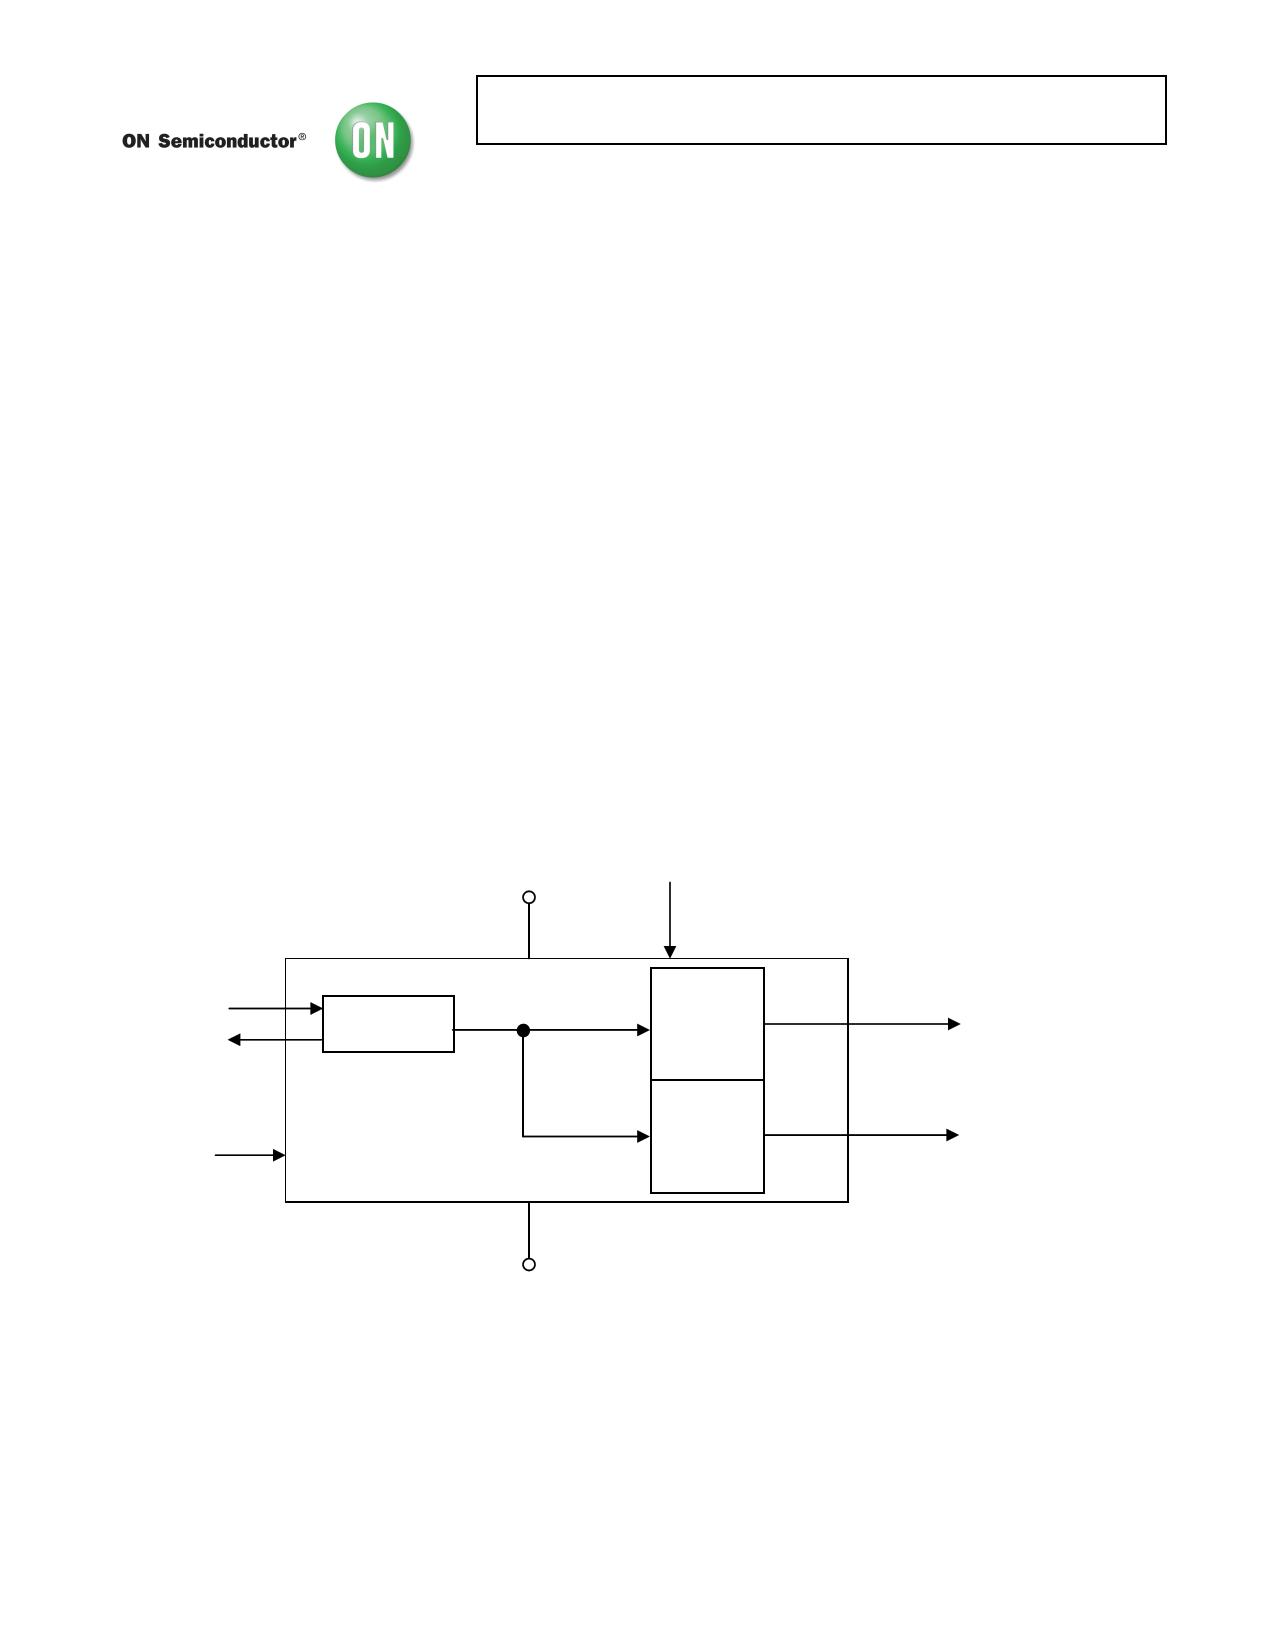 ASM3P2853A Datasheet, ASM3P2853A PDF,ピン配置, 機能